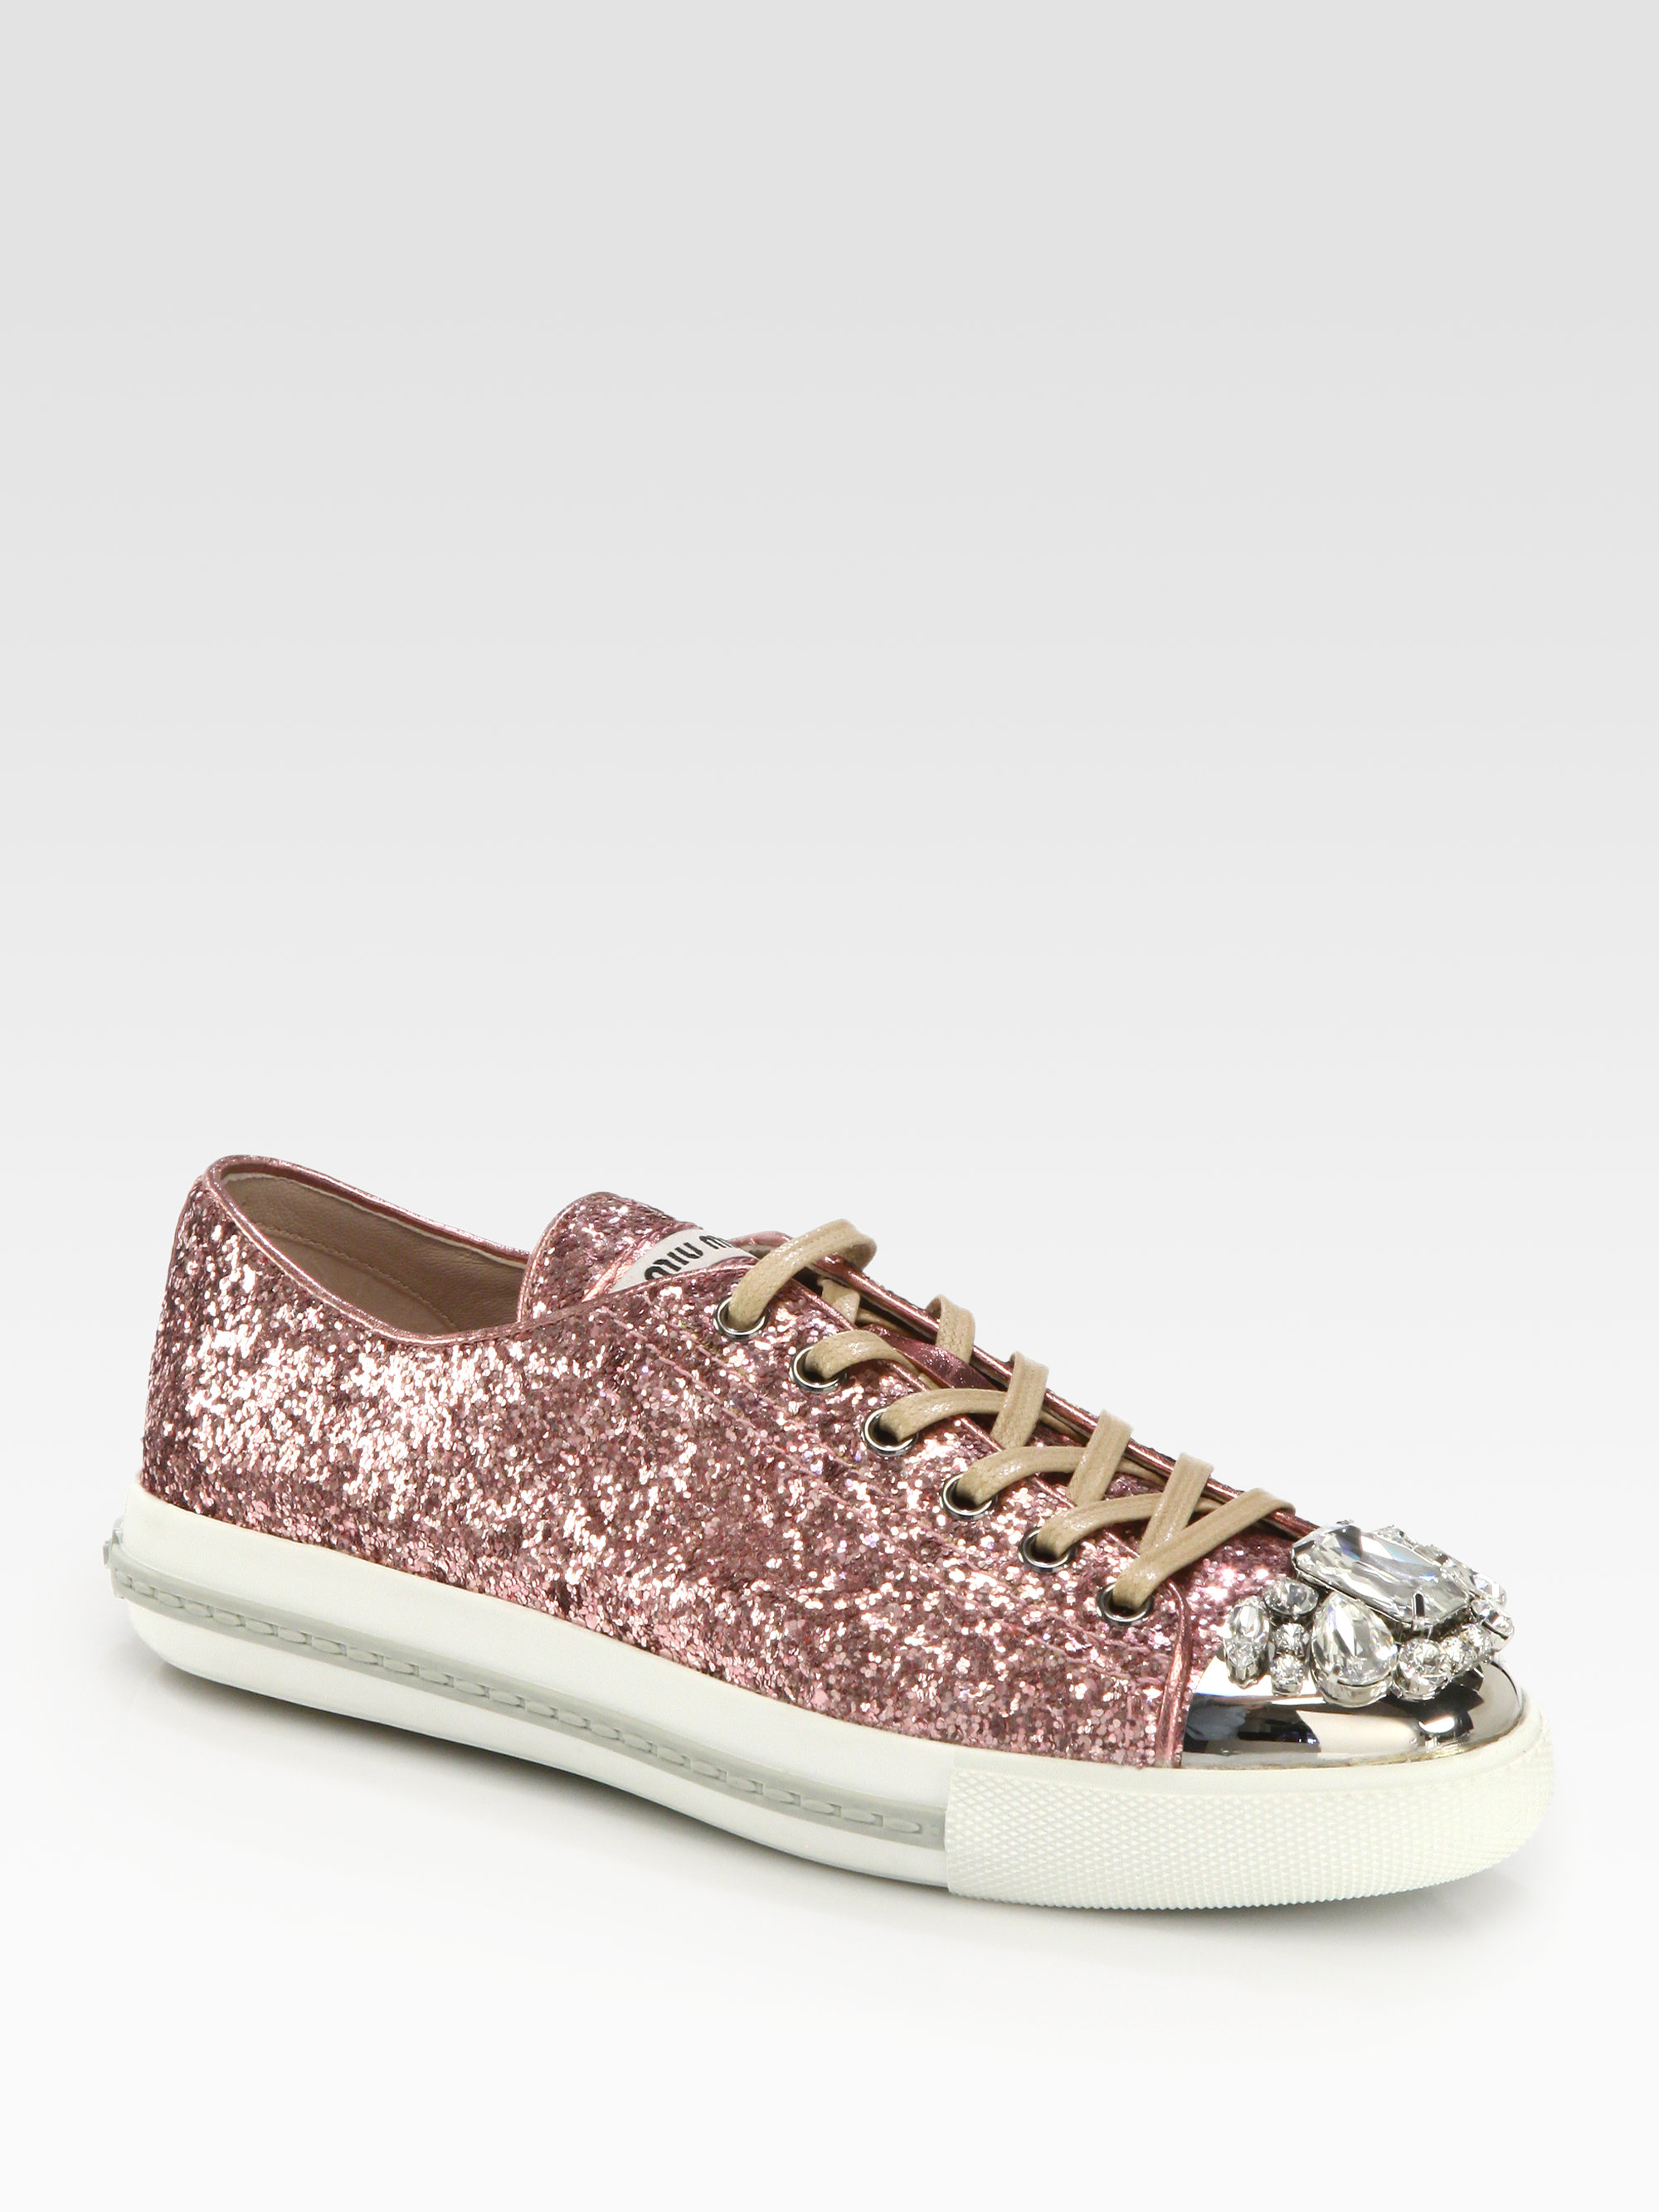 Lyst - Miu miu Glitter Jeweled Laceup Sneakers in Pink